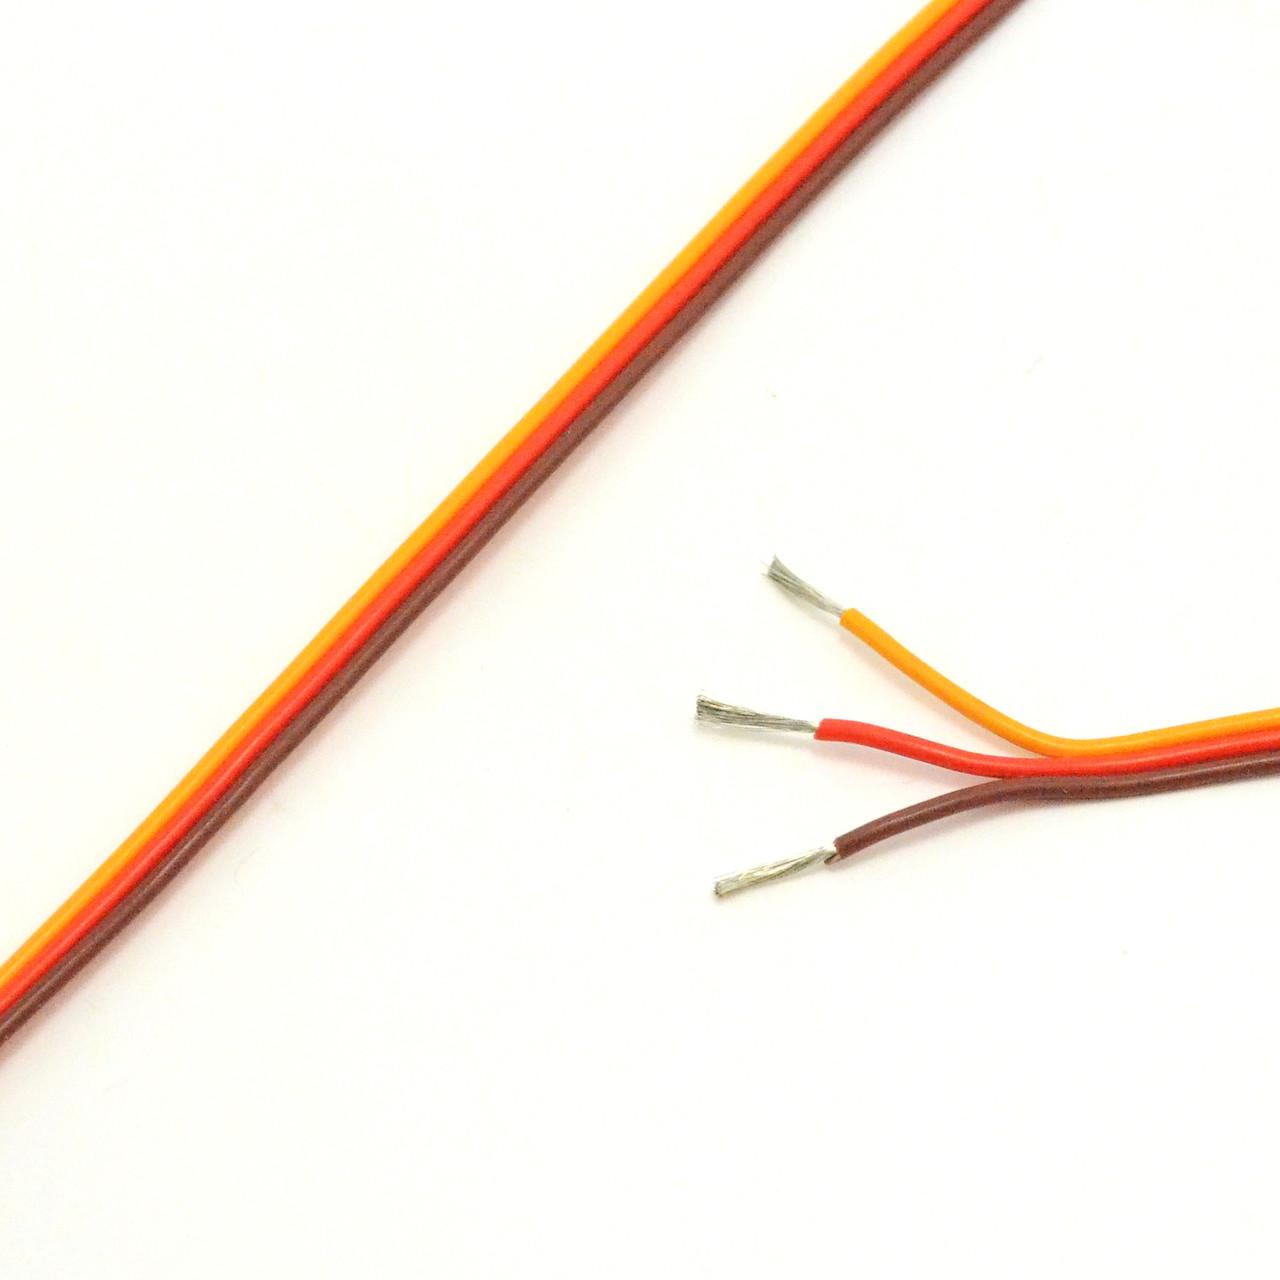 jr spektrum 22 awg servo wire 100 foot spool rc accessory spektrum rc logo rc  spektrum wiring